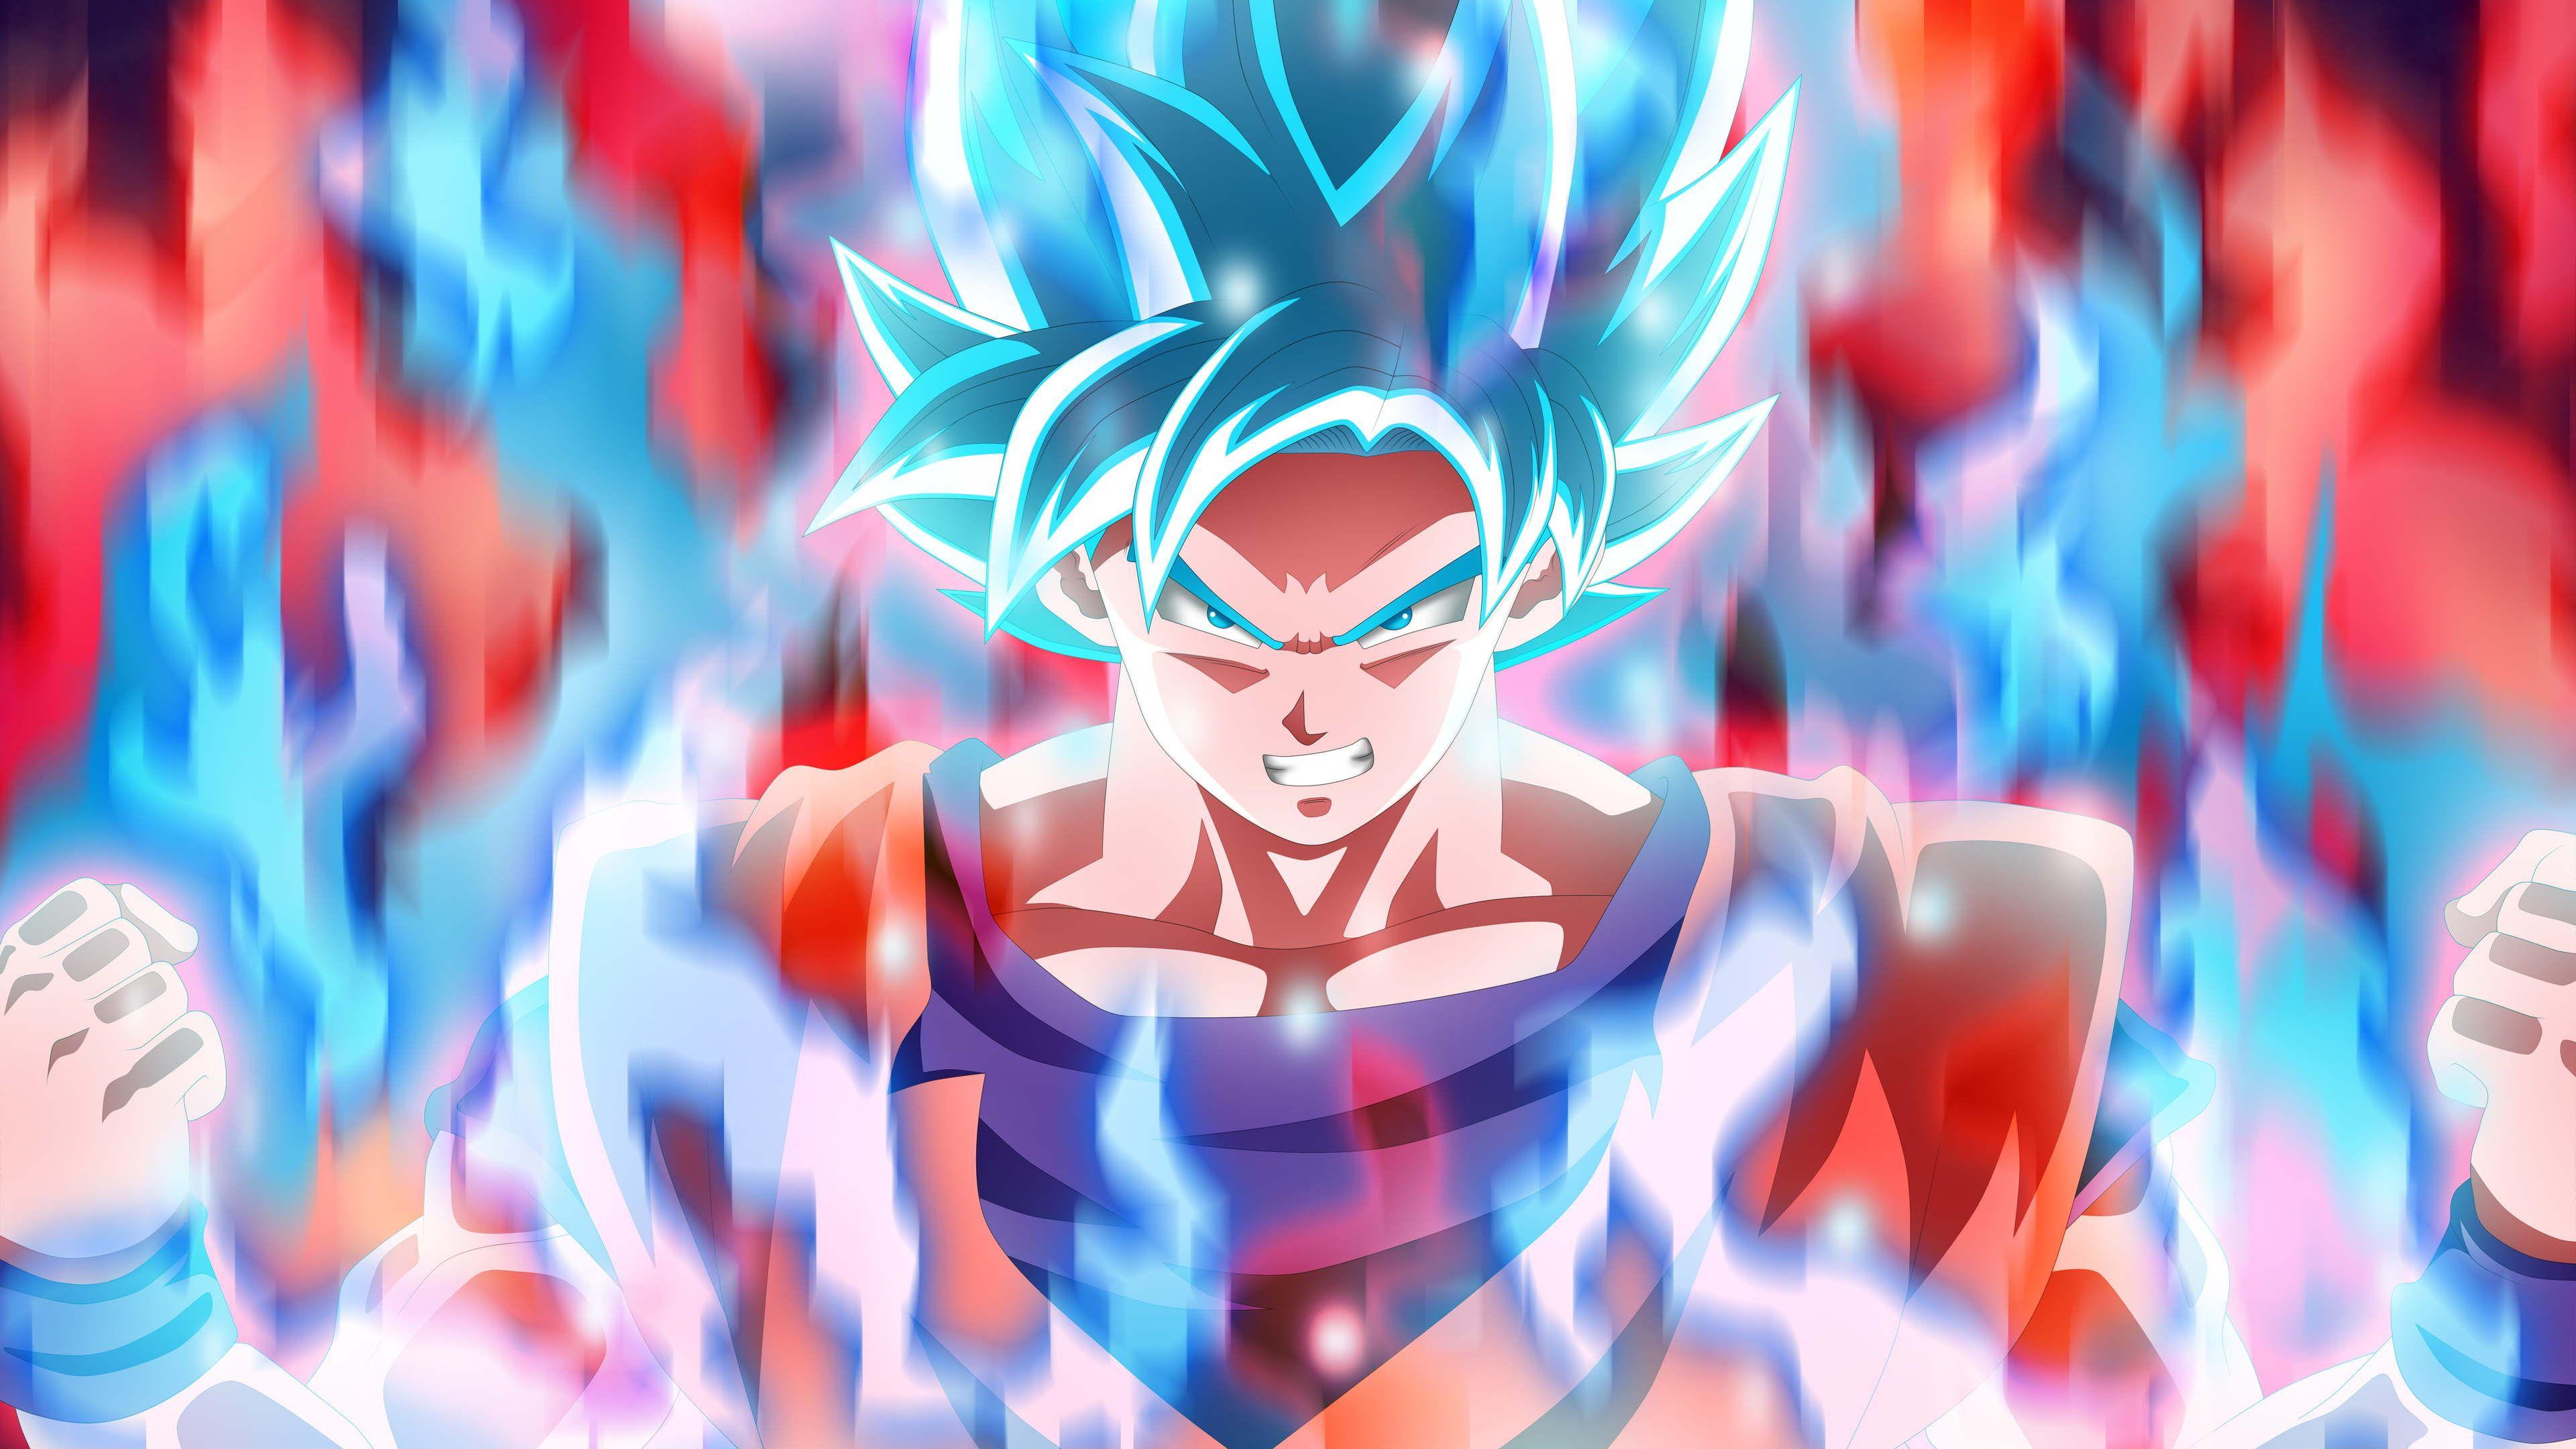 Lbcloomis Wallpaper Hd New Wallpaper Goku Super Saiyan God Blue Goku Wallpaper Dragon Ball Super Wallpapers Anime